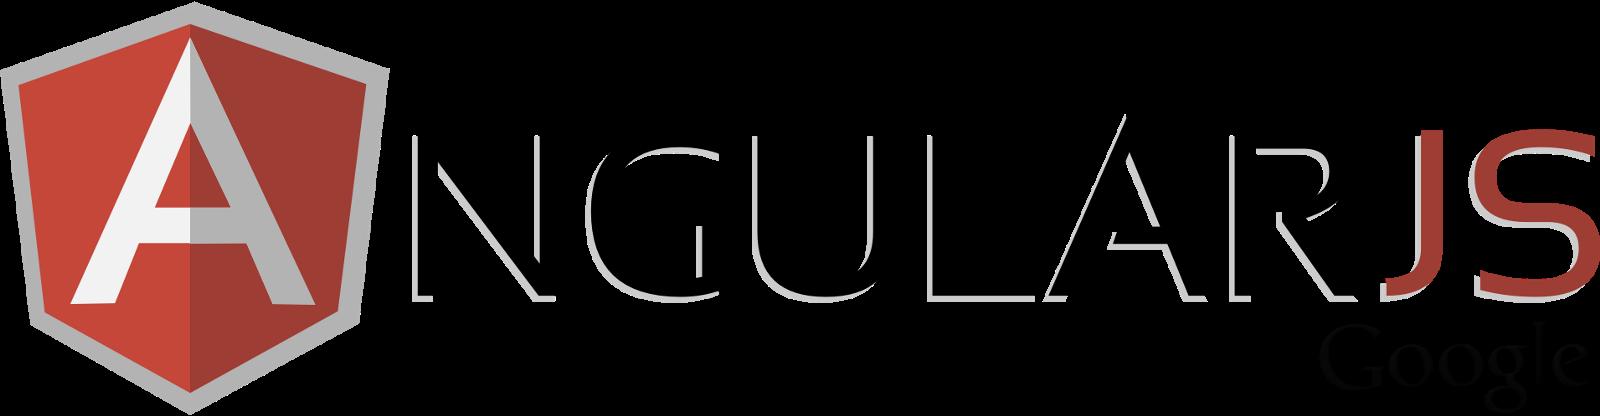 AngularJS תמונת אווירה